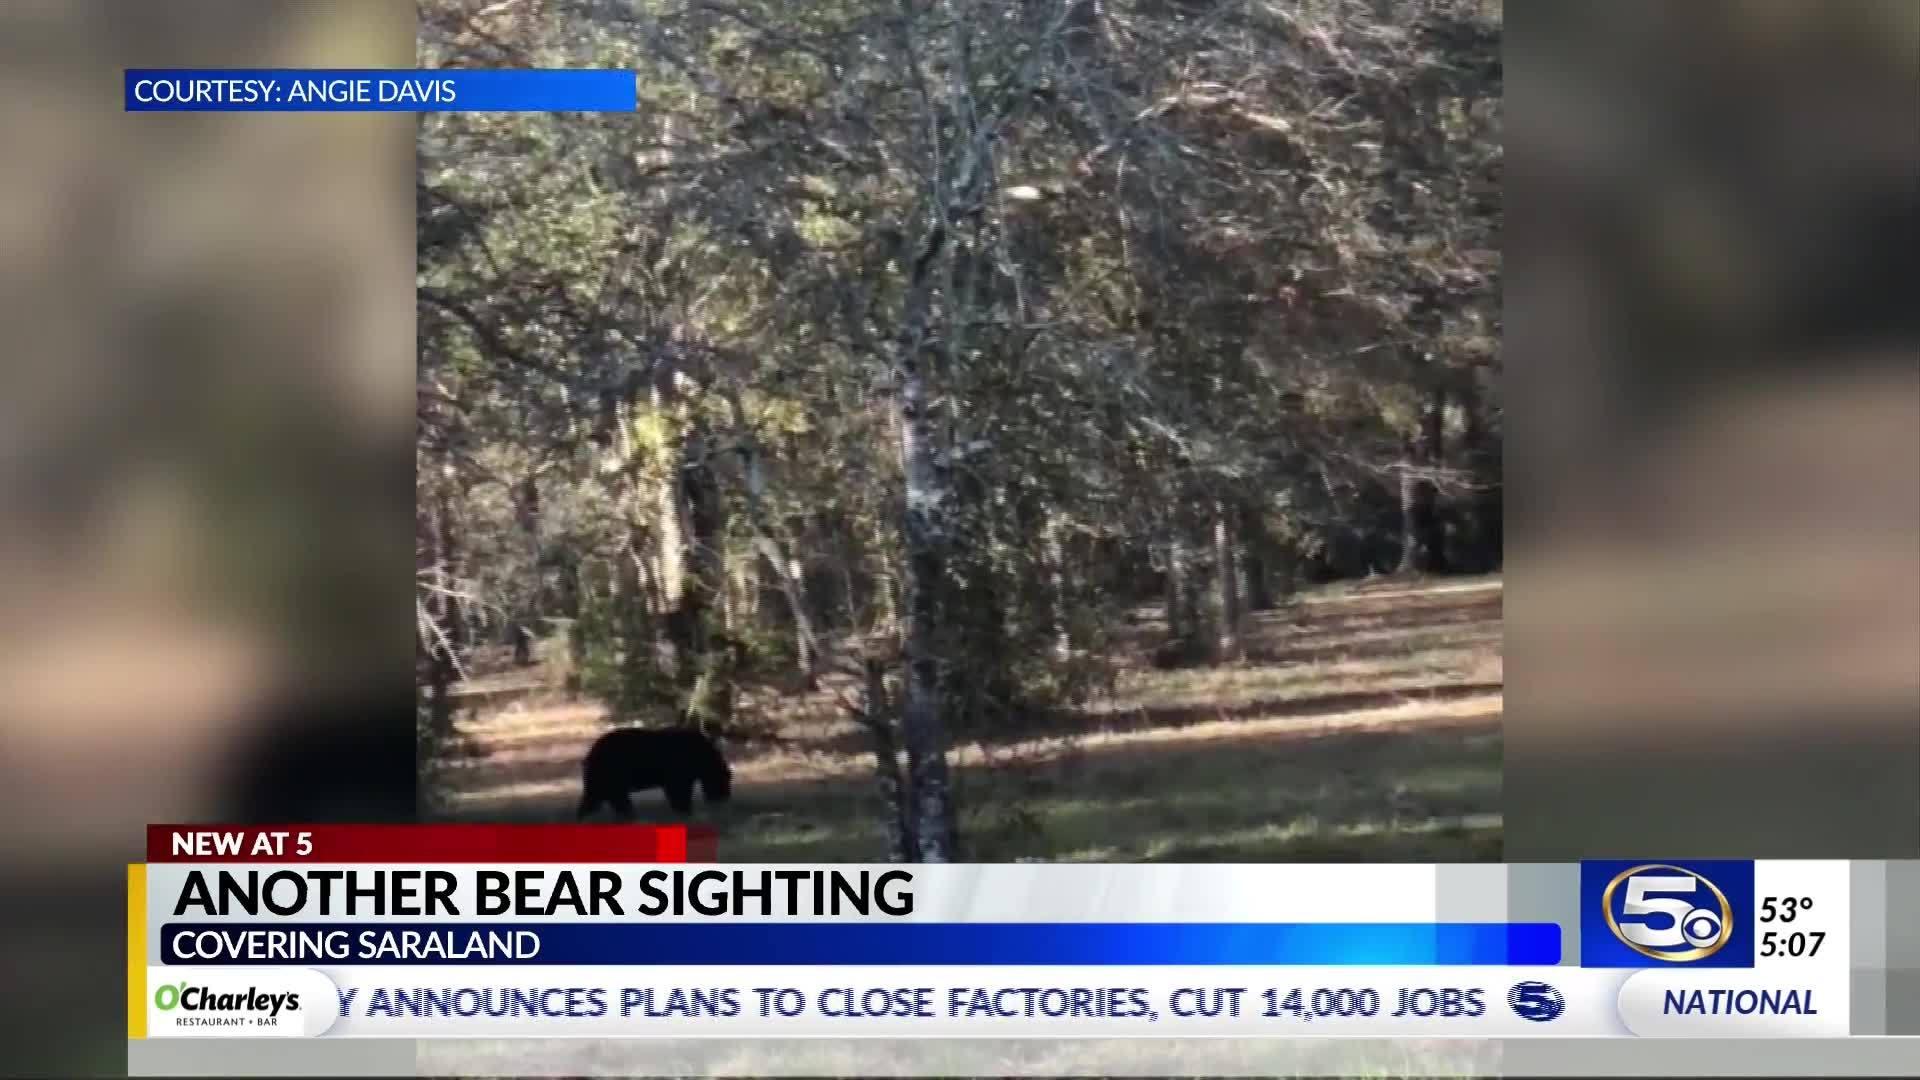 saraland_bear_sighting_6_20181128234149